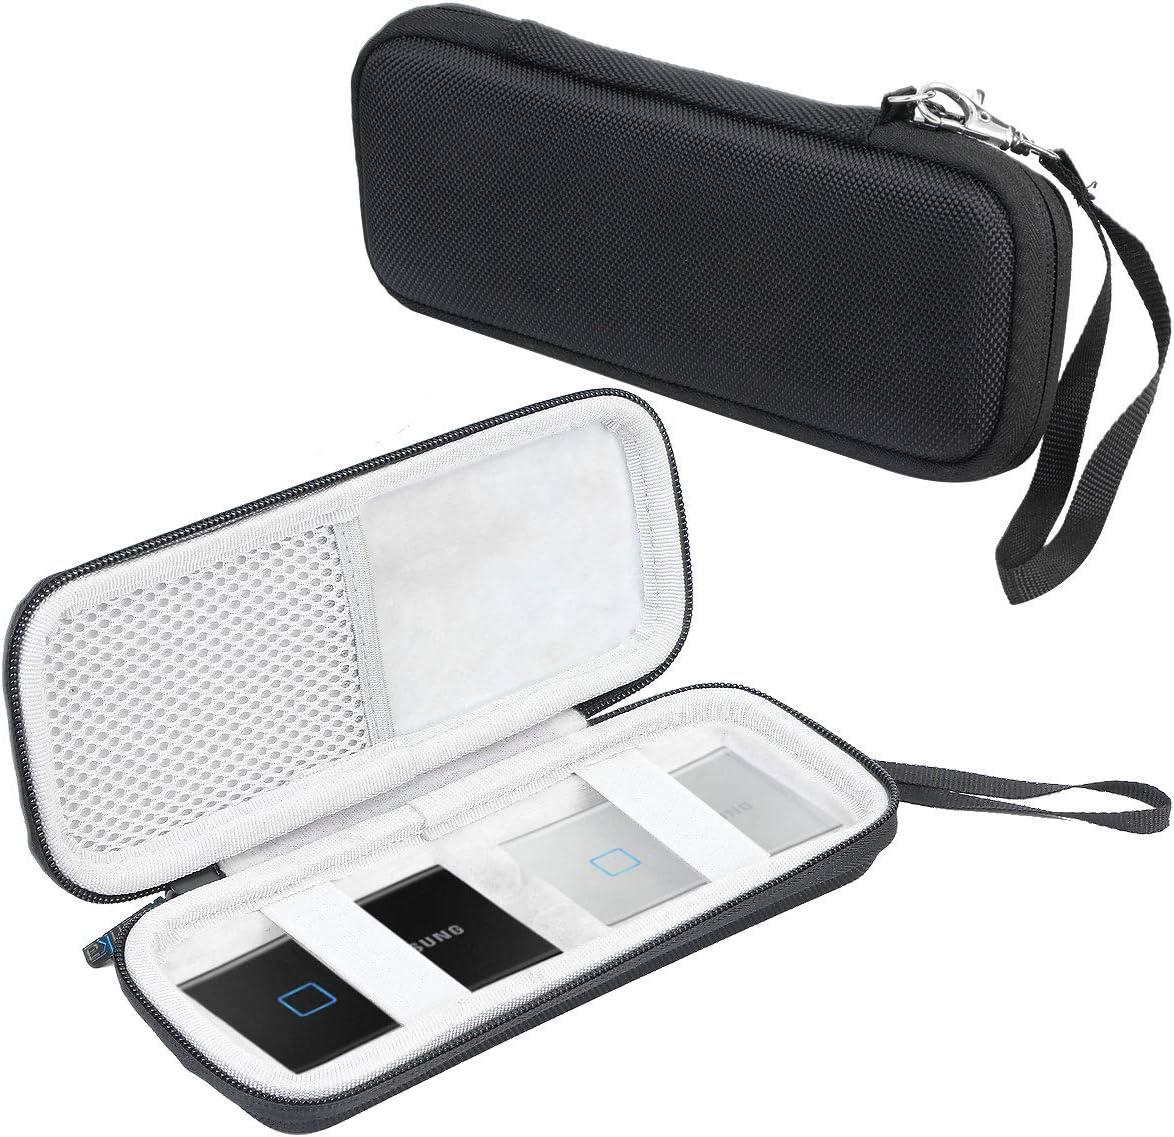 Khanka Duro Viaje Estuche Bolso Funda para Samsung T7 Touch Portable SSD 500GB 1TB 2TB (Se Adapta a 2 SSD, Vertical): Amazon.es: Electrónica